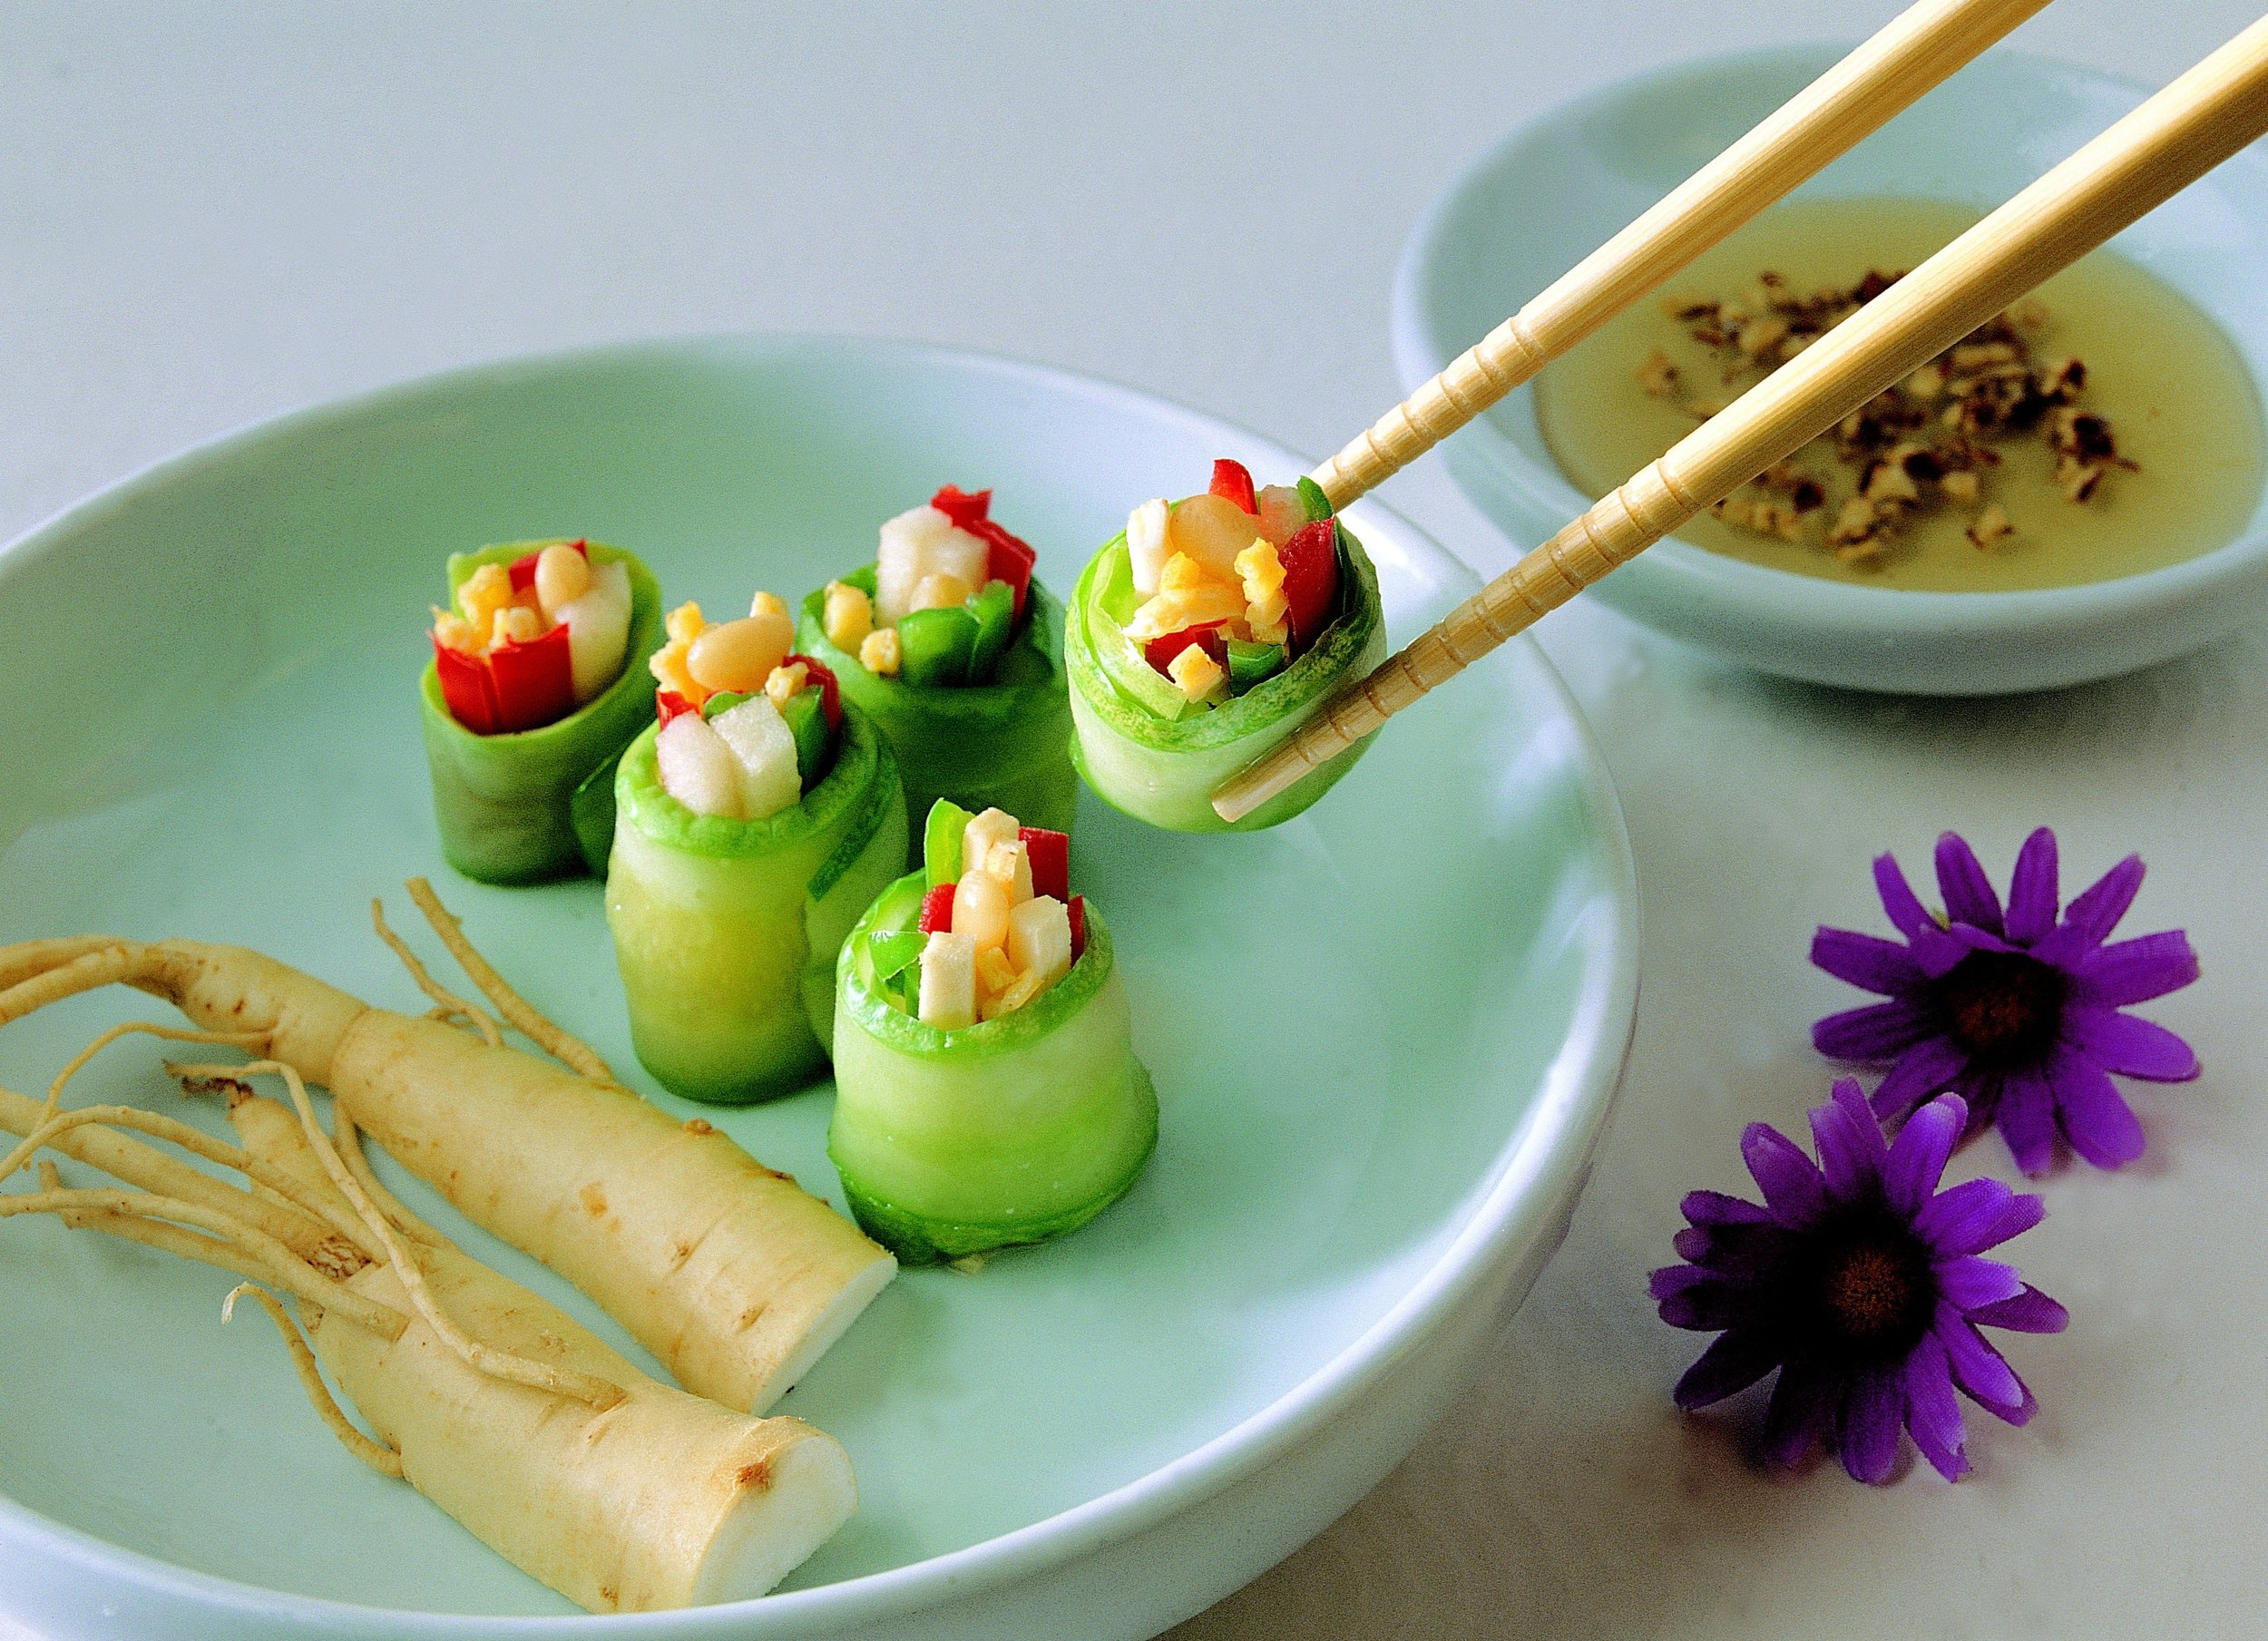 vegan food with chopstick.jpg